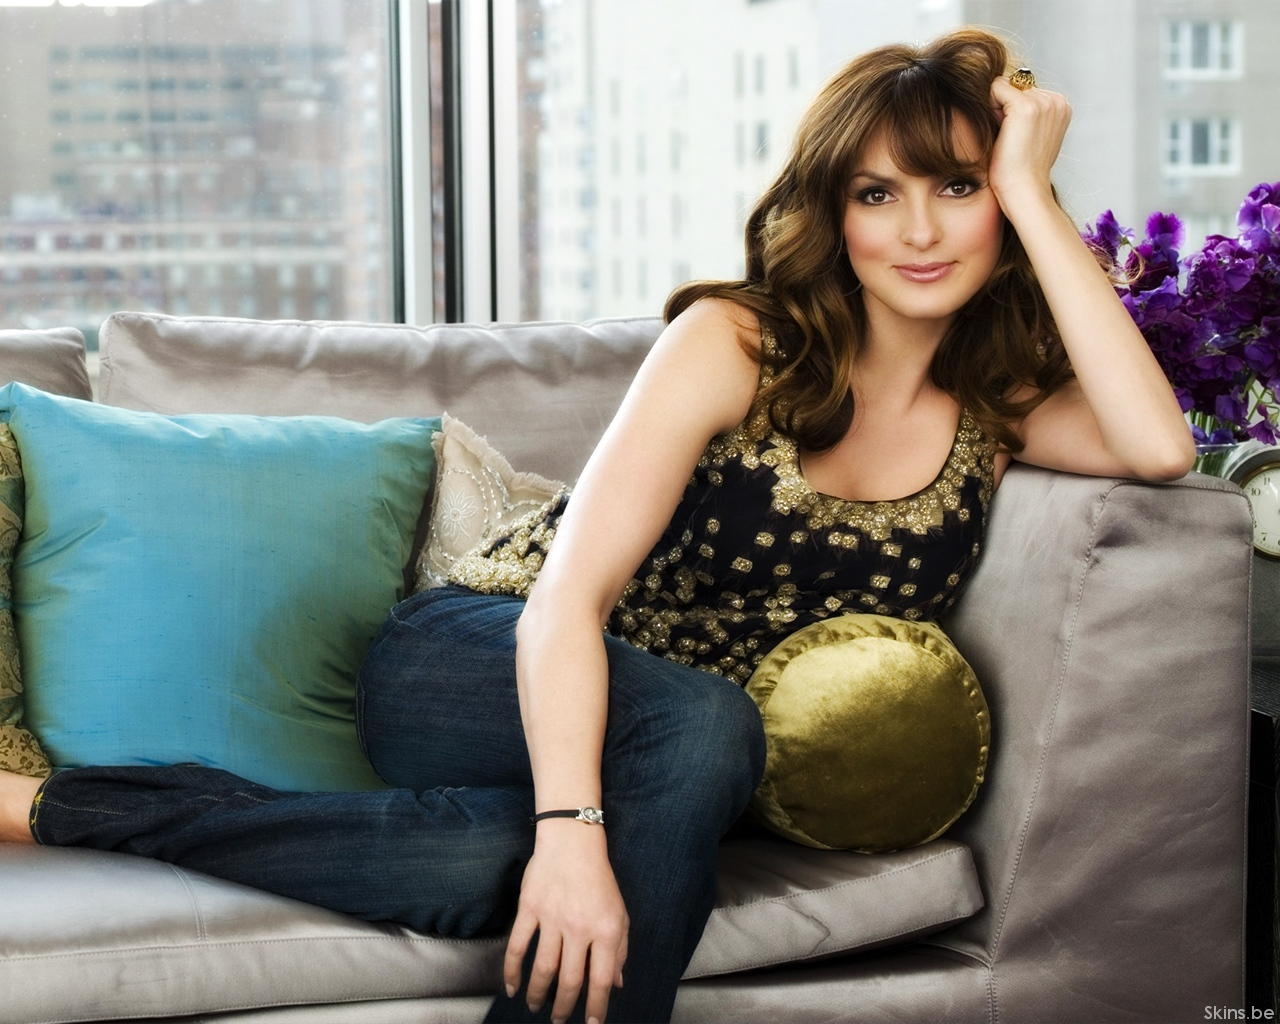 http://www.shareyourwallpaper.com/upload/wallpaper/celebrities-female/mariska-hargitay/mariska-hargitay_aaffb88b.jpg